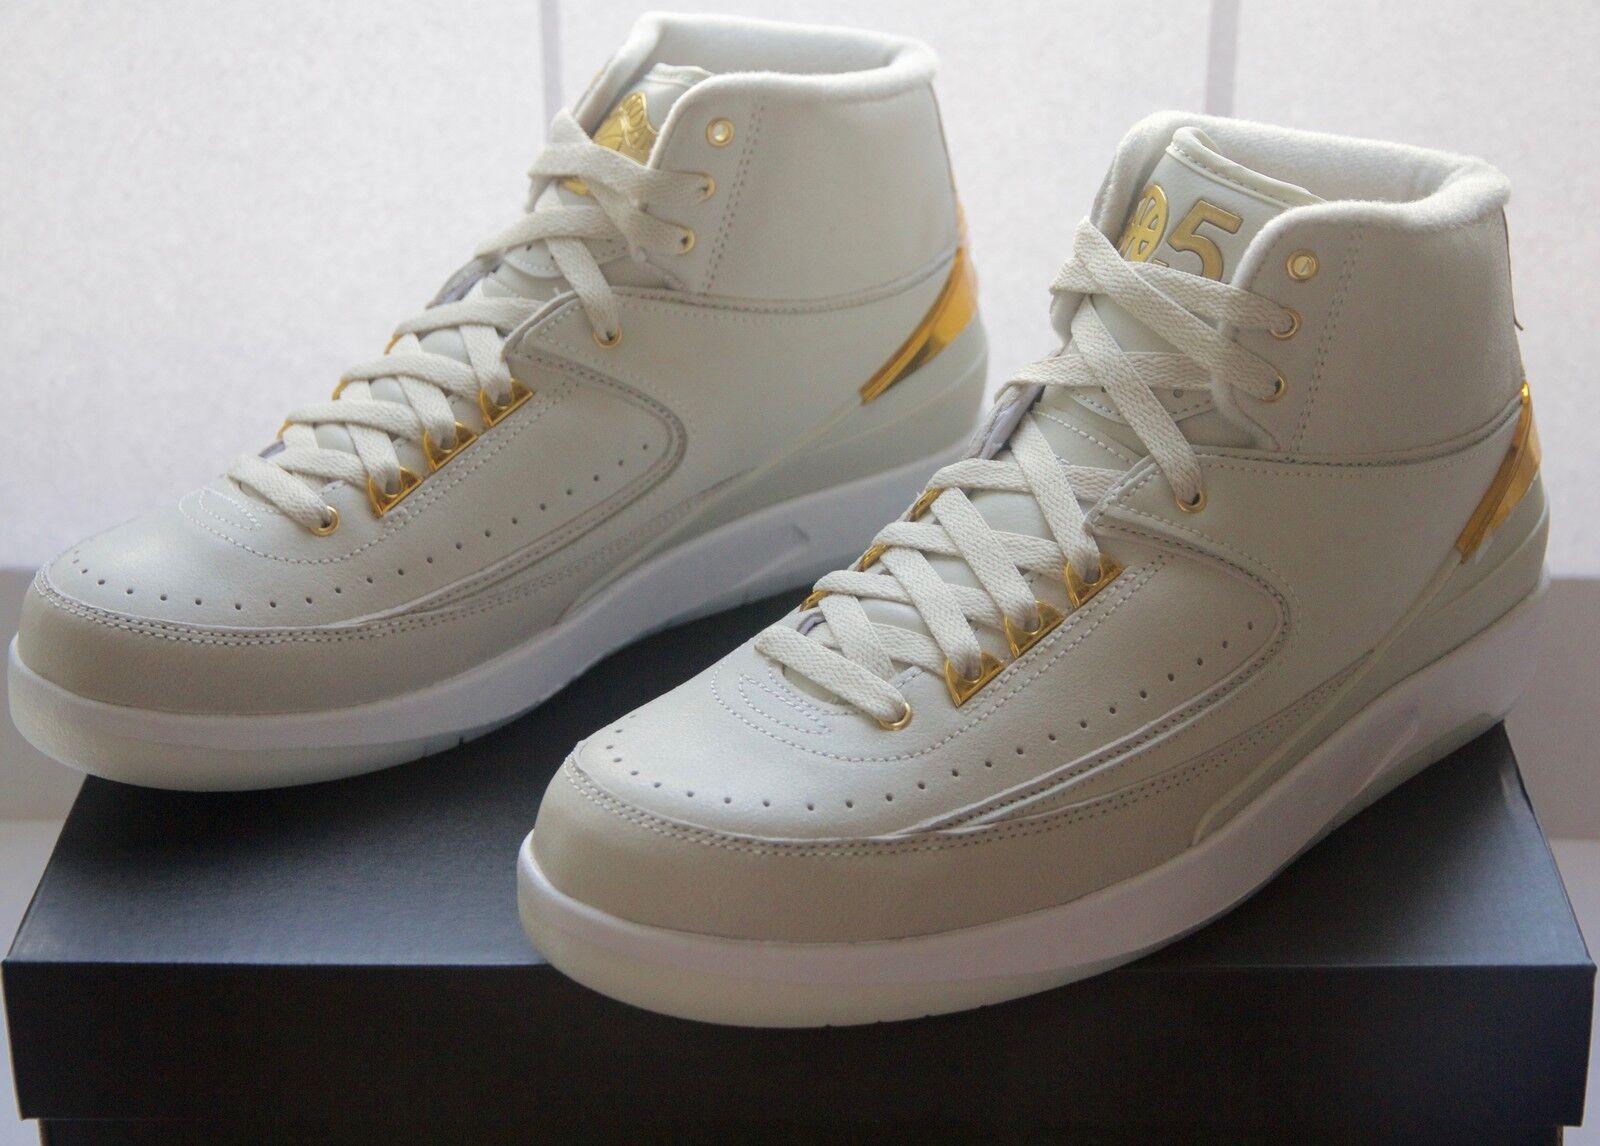 Nike Air oro Jordan II 2 retro quai 54 Bone oro Air nuevo cartón New 028f70